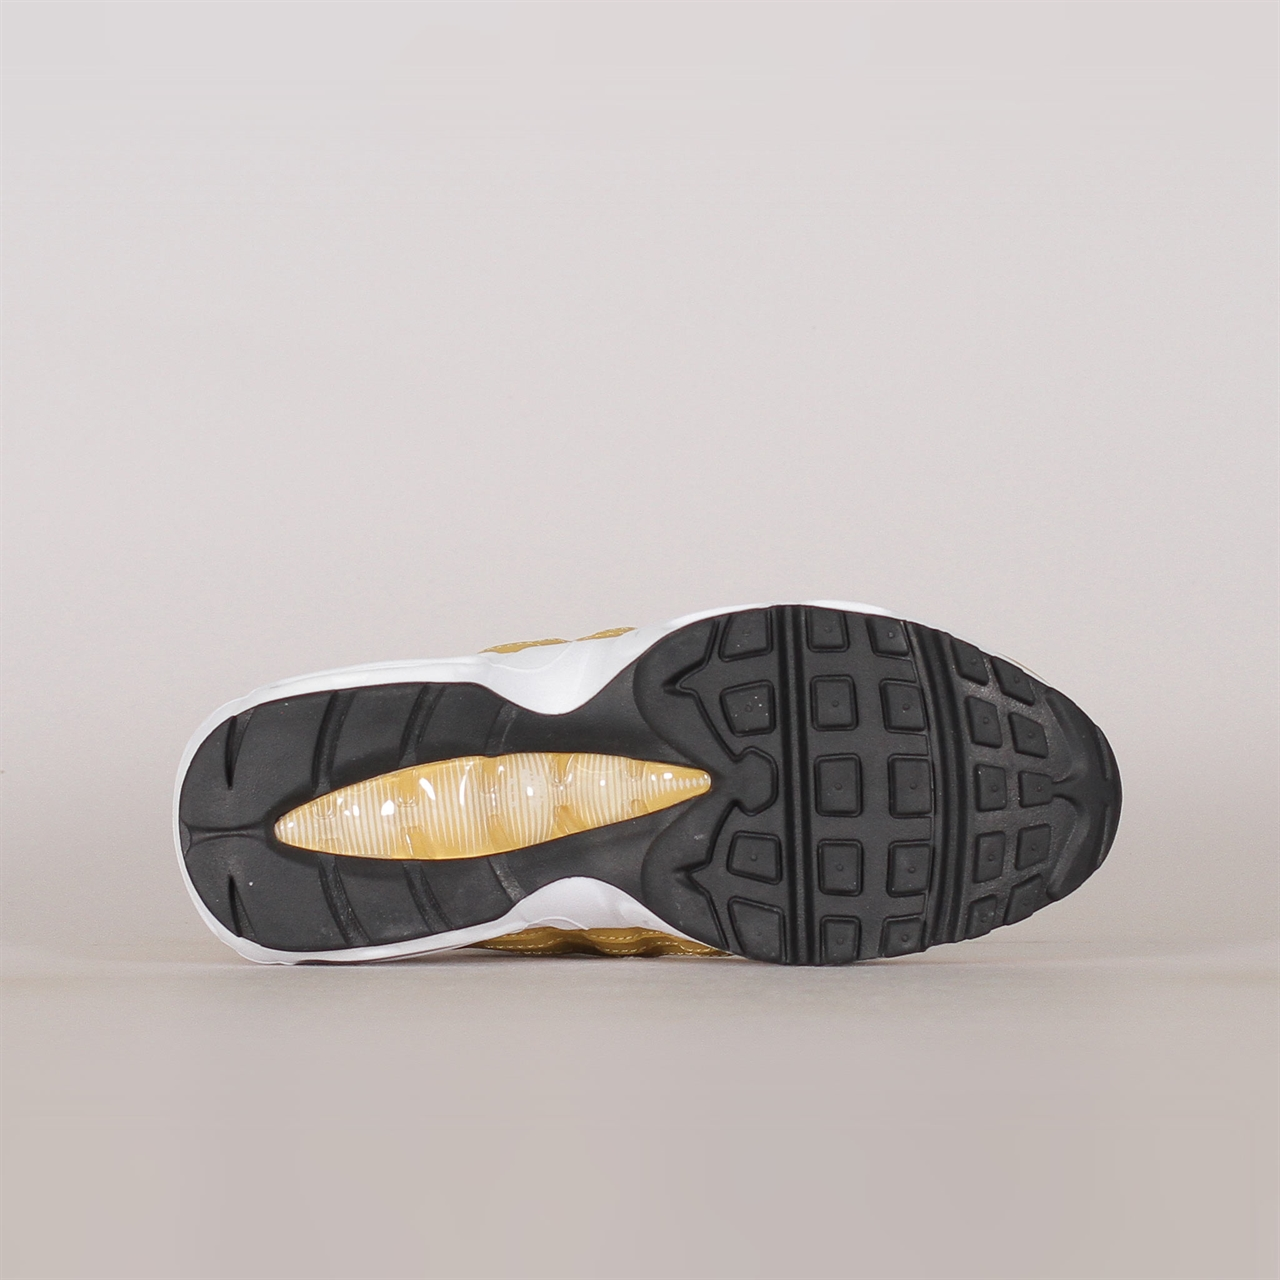 Shelta Nike Sportswear Womens Air Max 95 LX (AA1103 701)